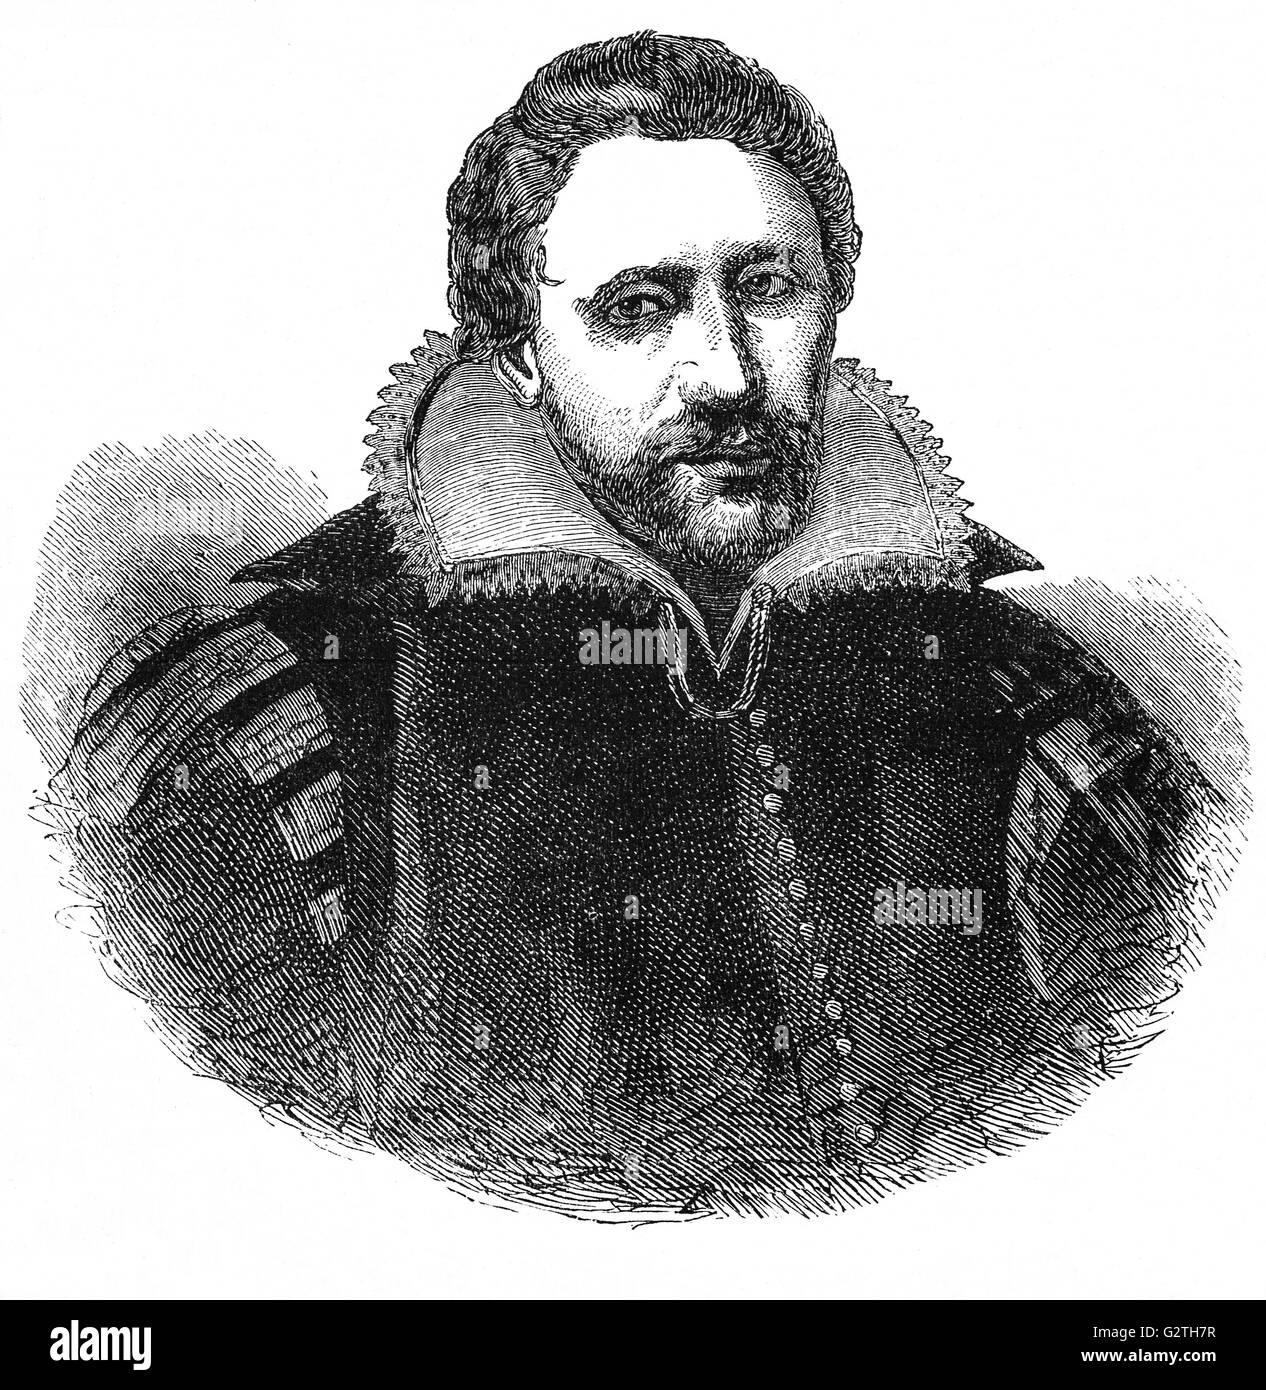 Benjamin 'Ben' Jonson, English Poet Laureate, playwright, actor and literary critic of the 17th century - Stock Image